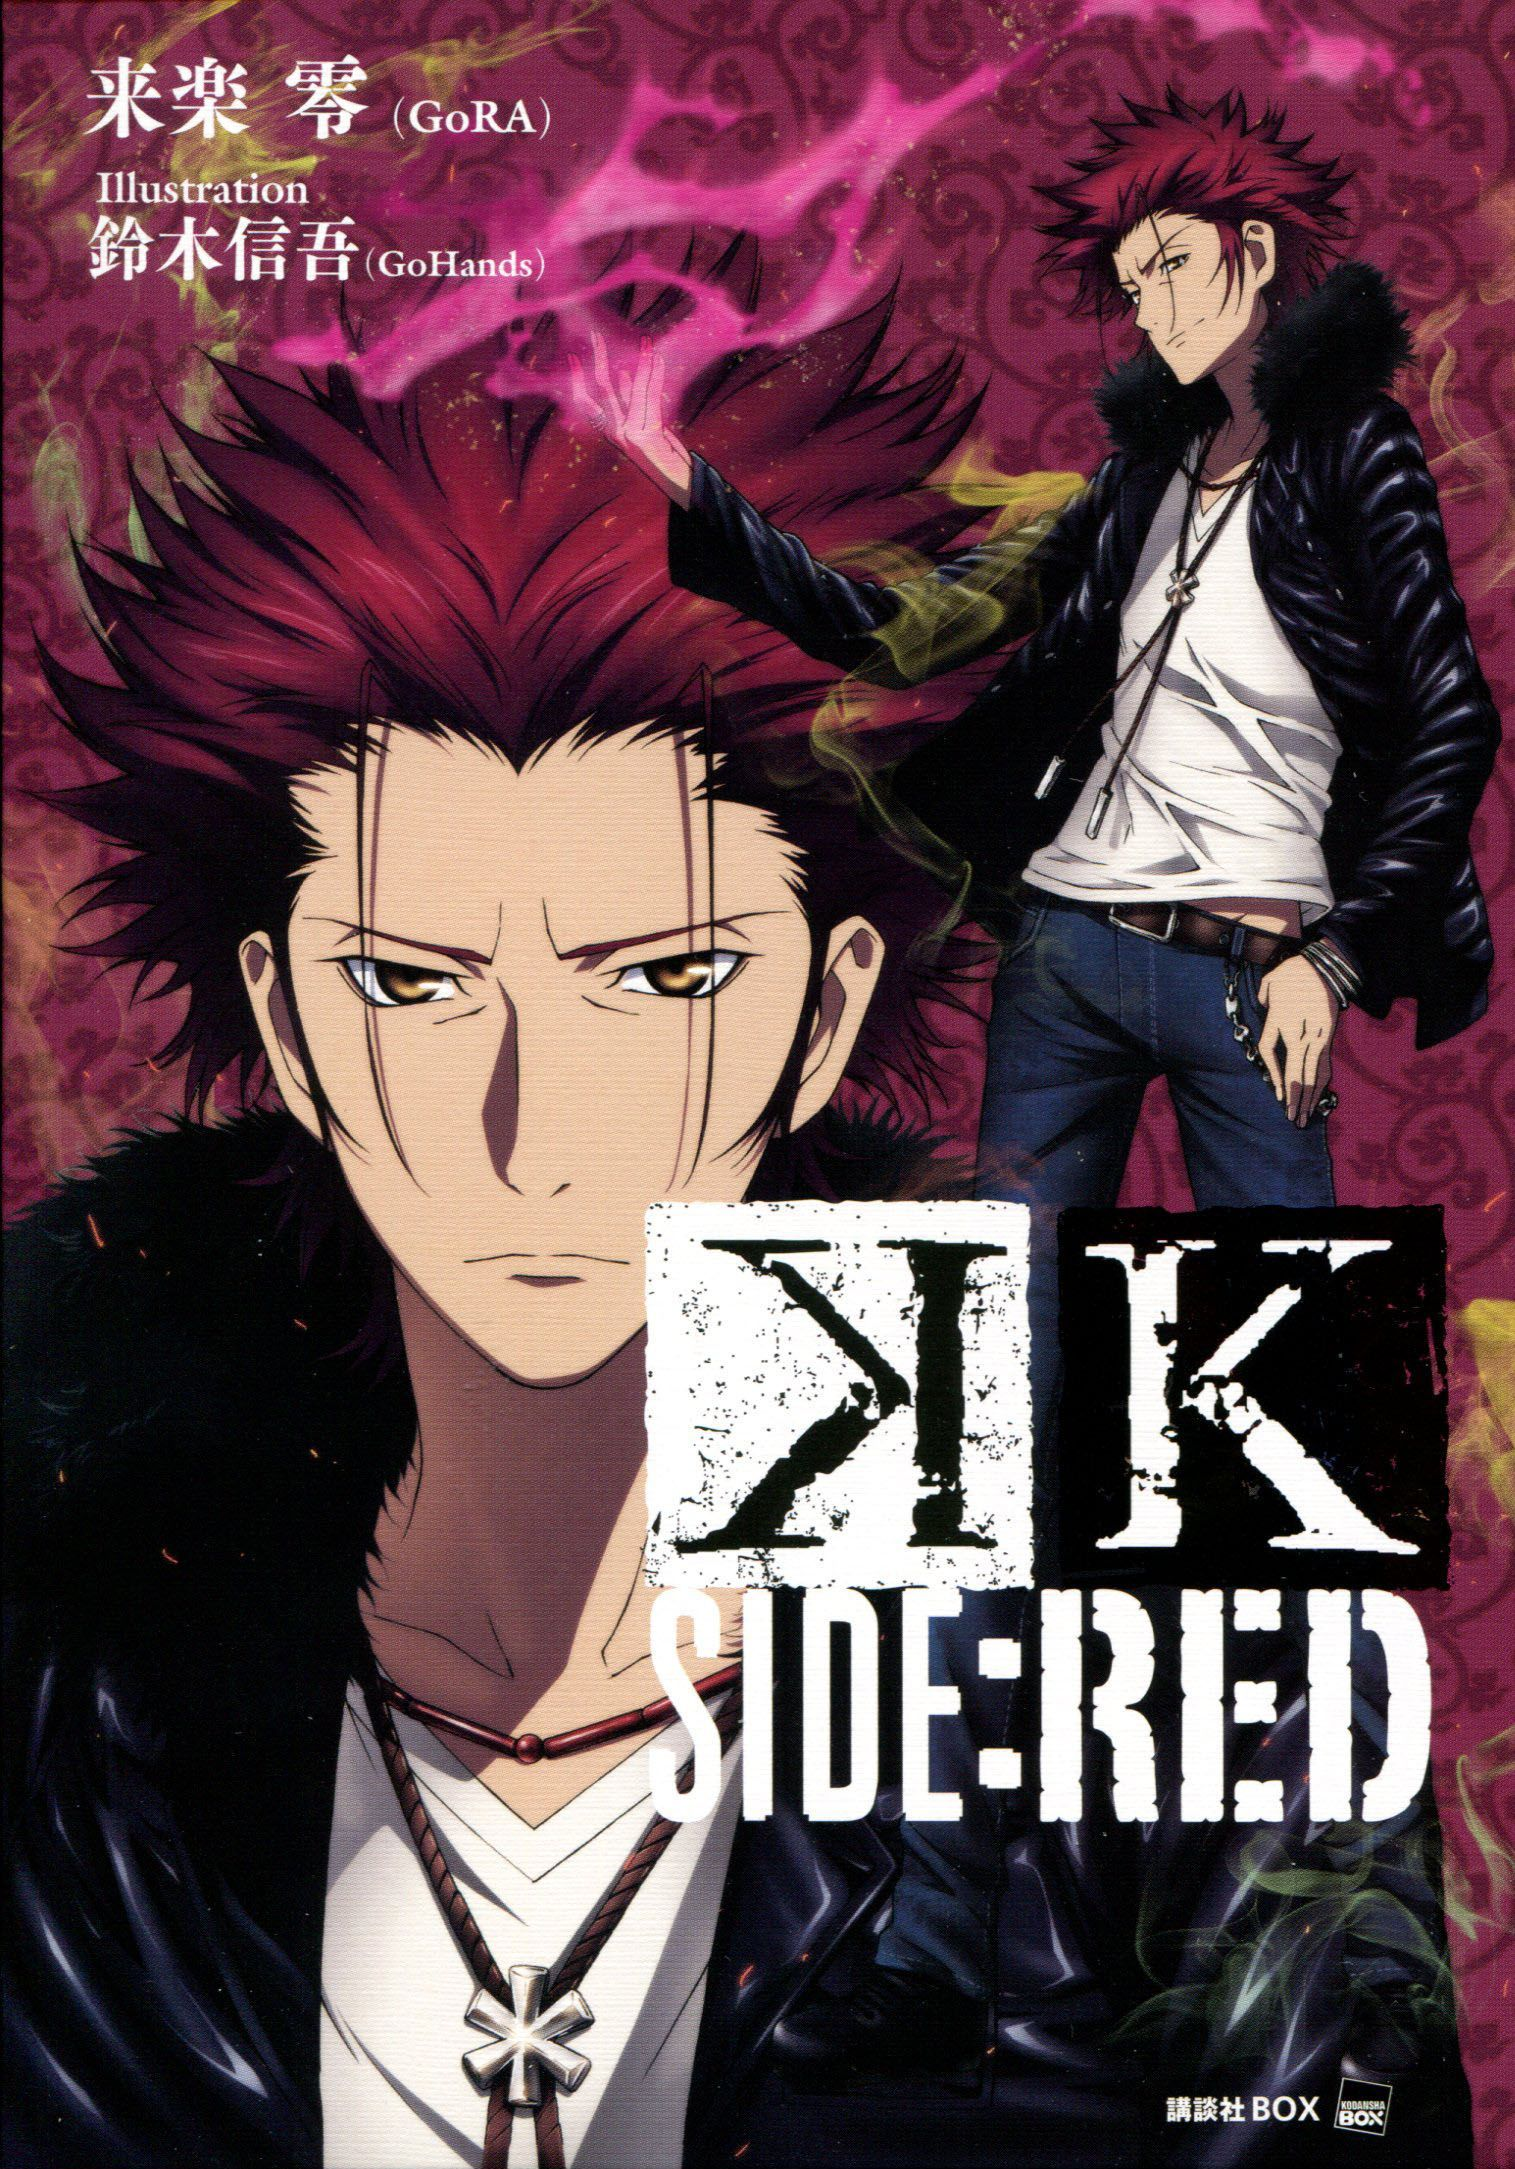 /Suoh Mikoto/1364085 Zerochan K project anime, K